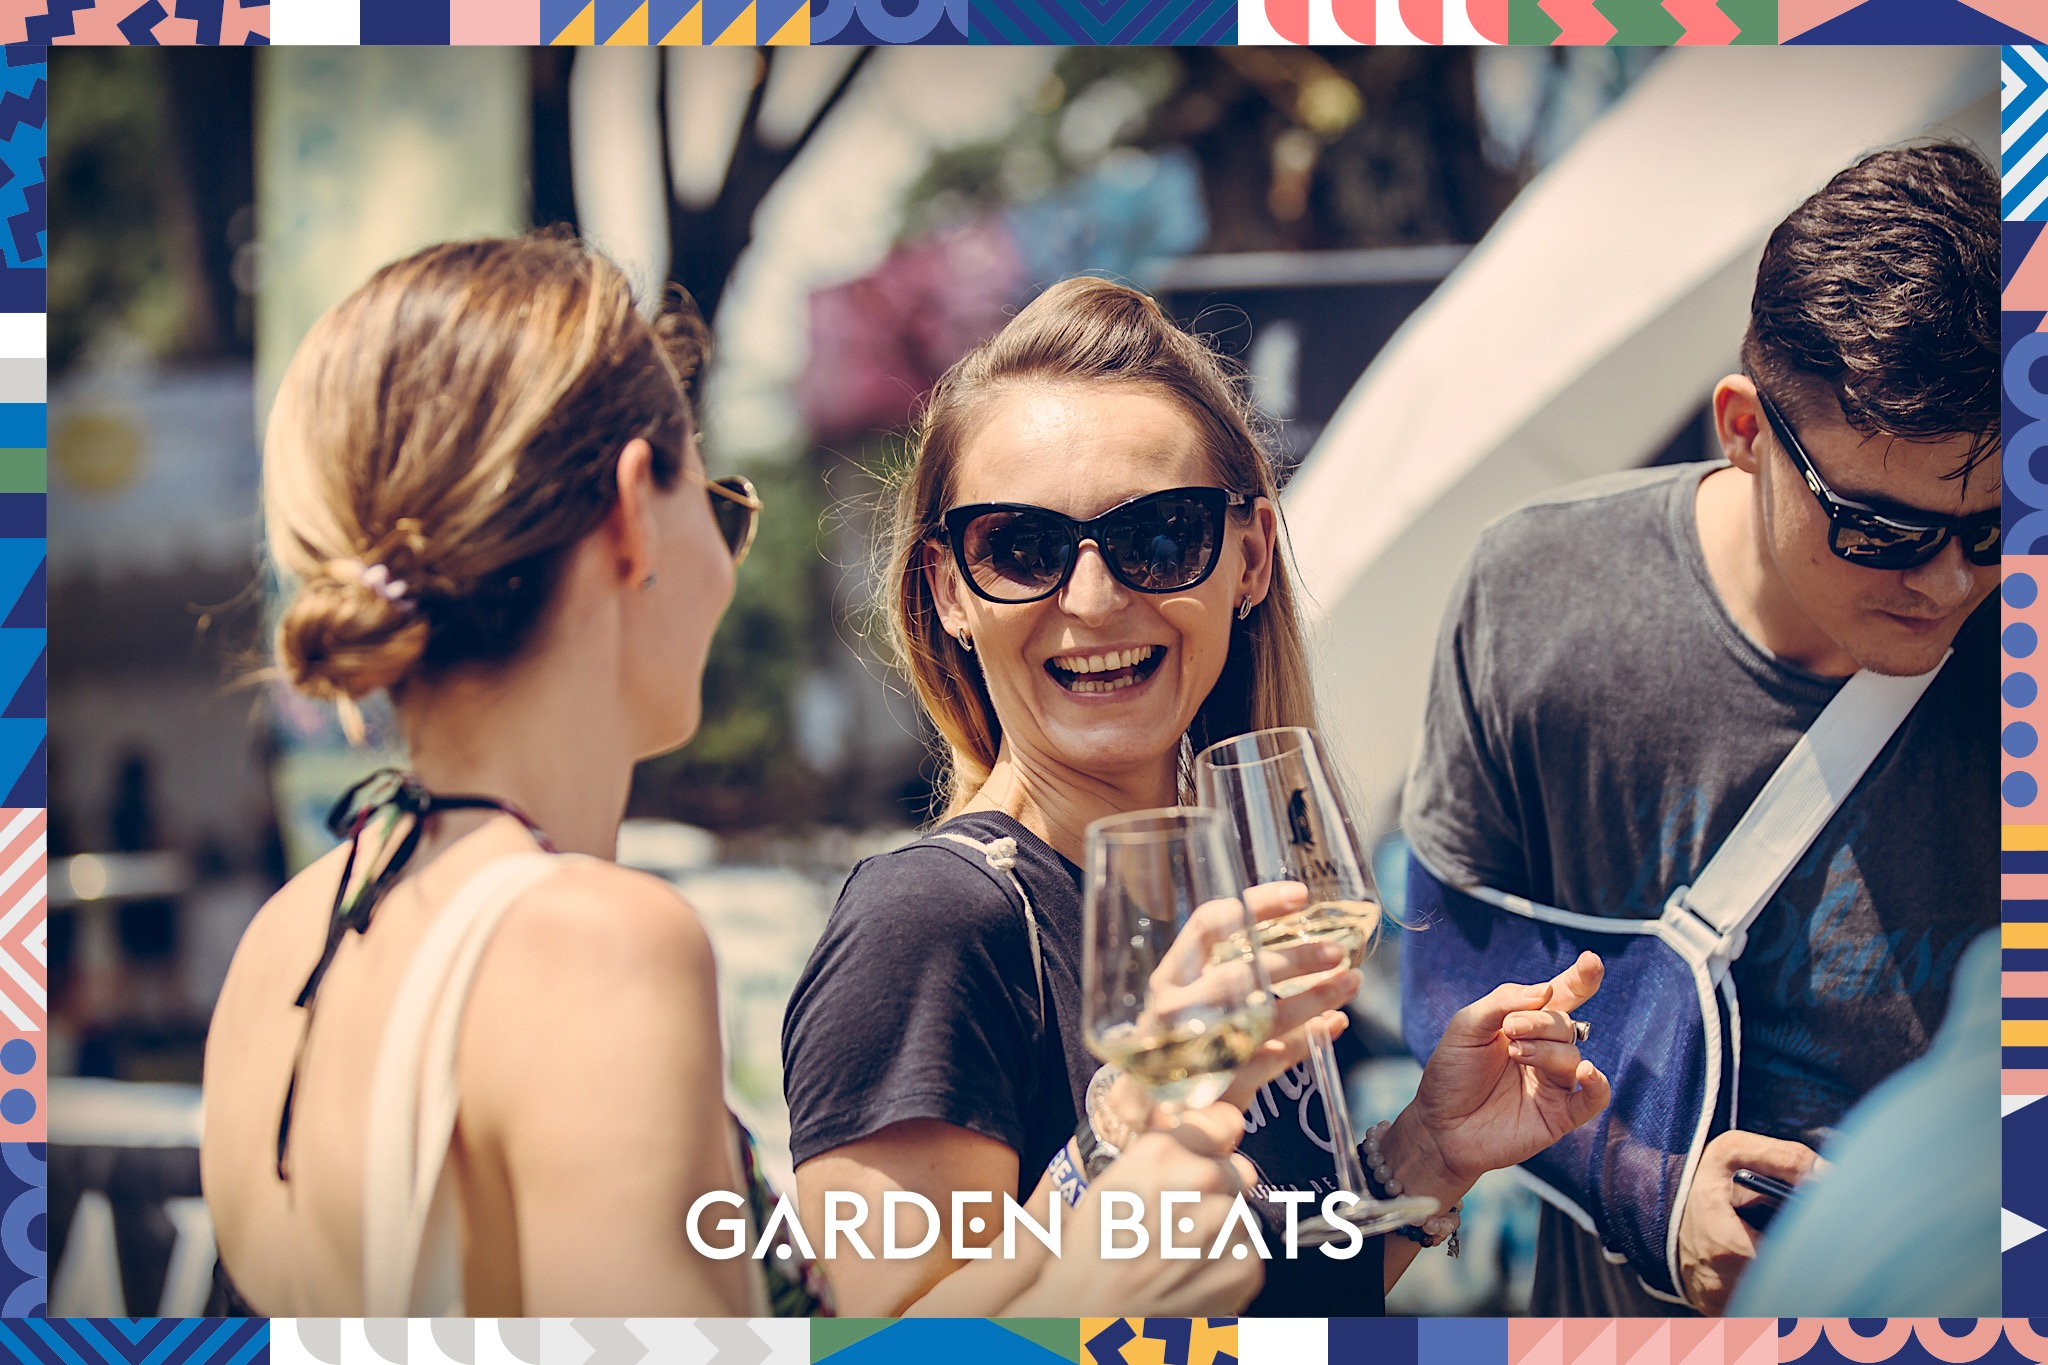 03032018_GardenBeats_Colossal157_Watermarked.jpg